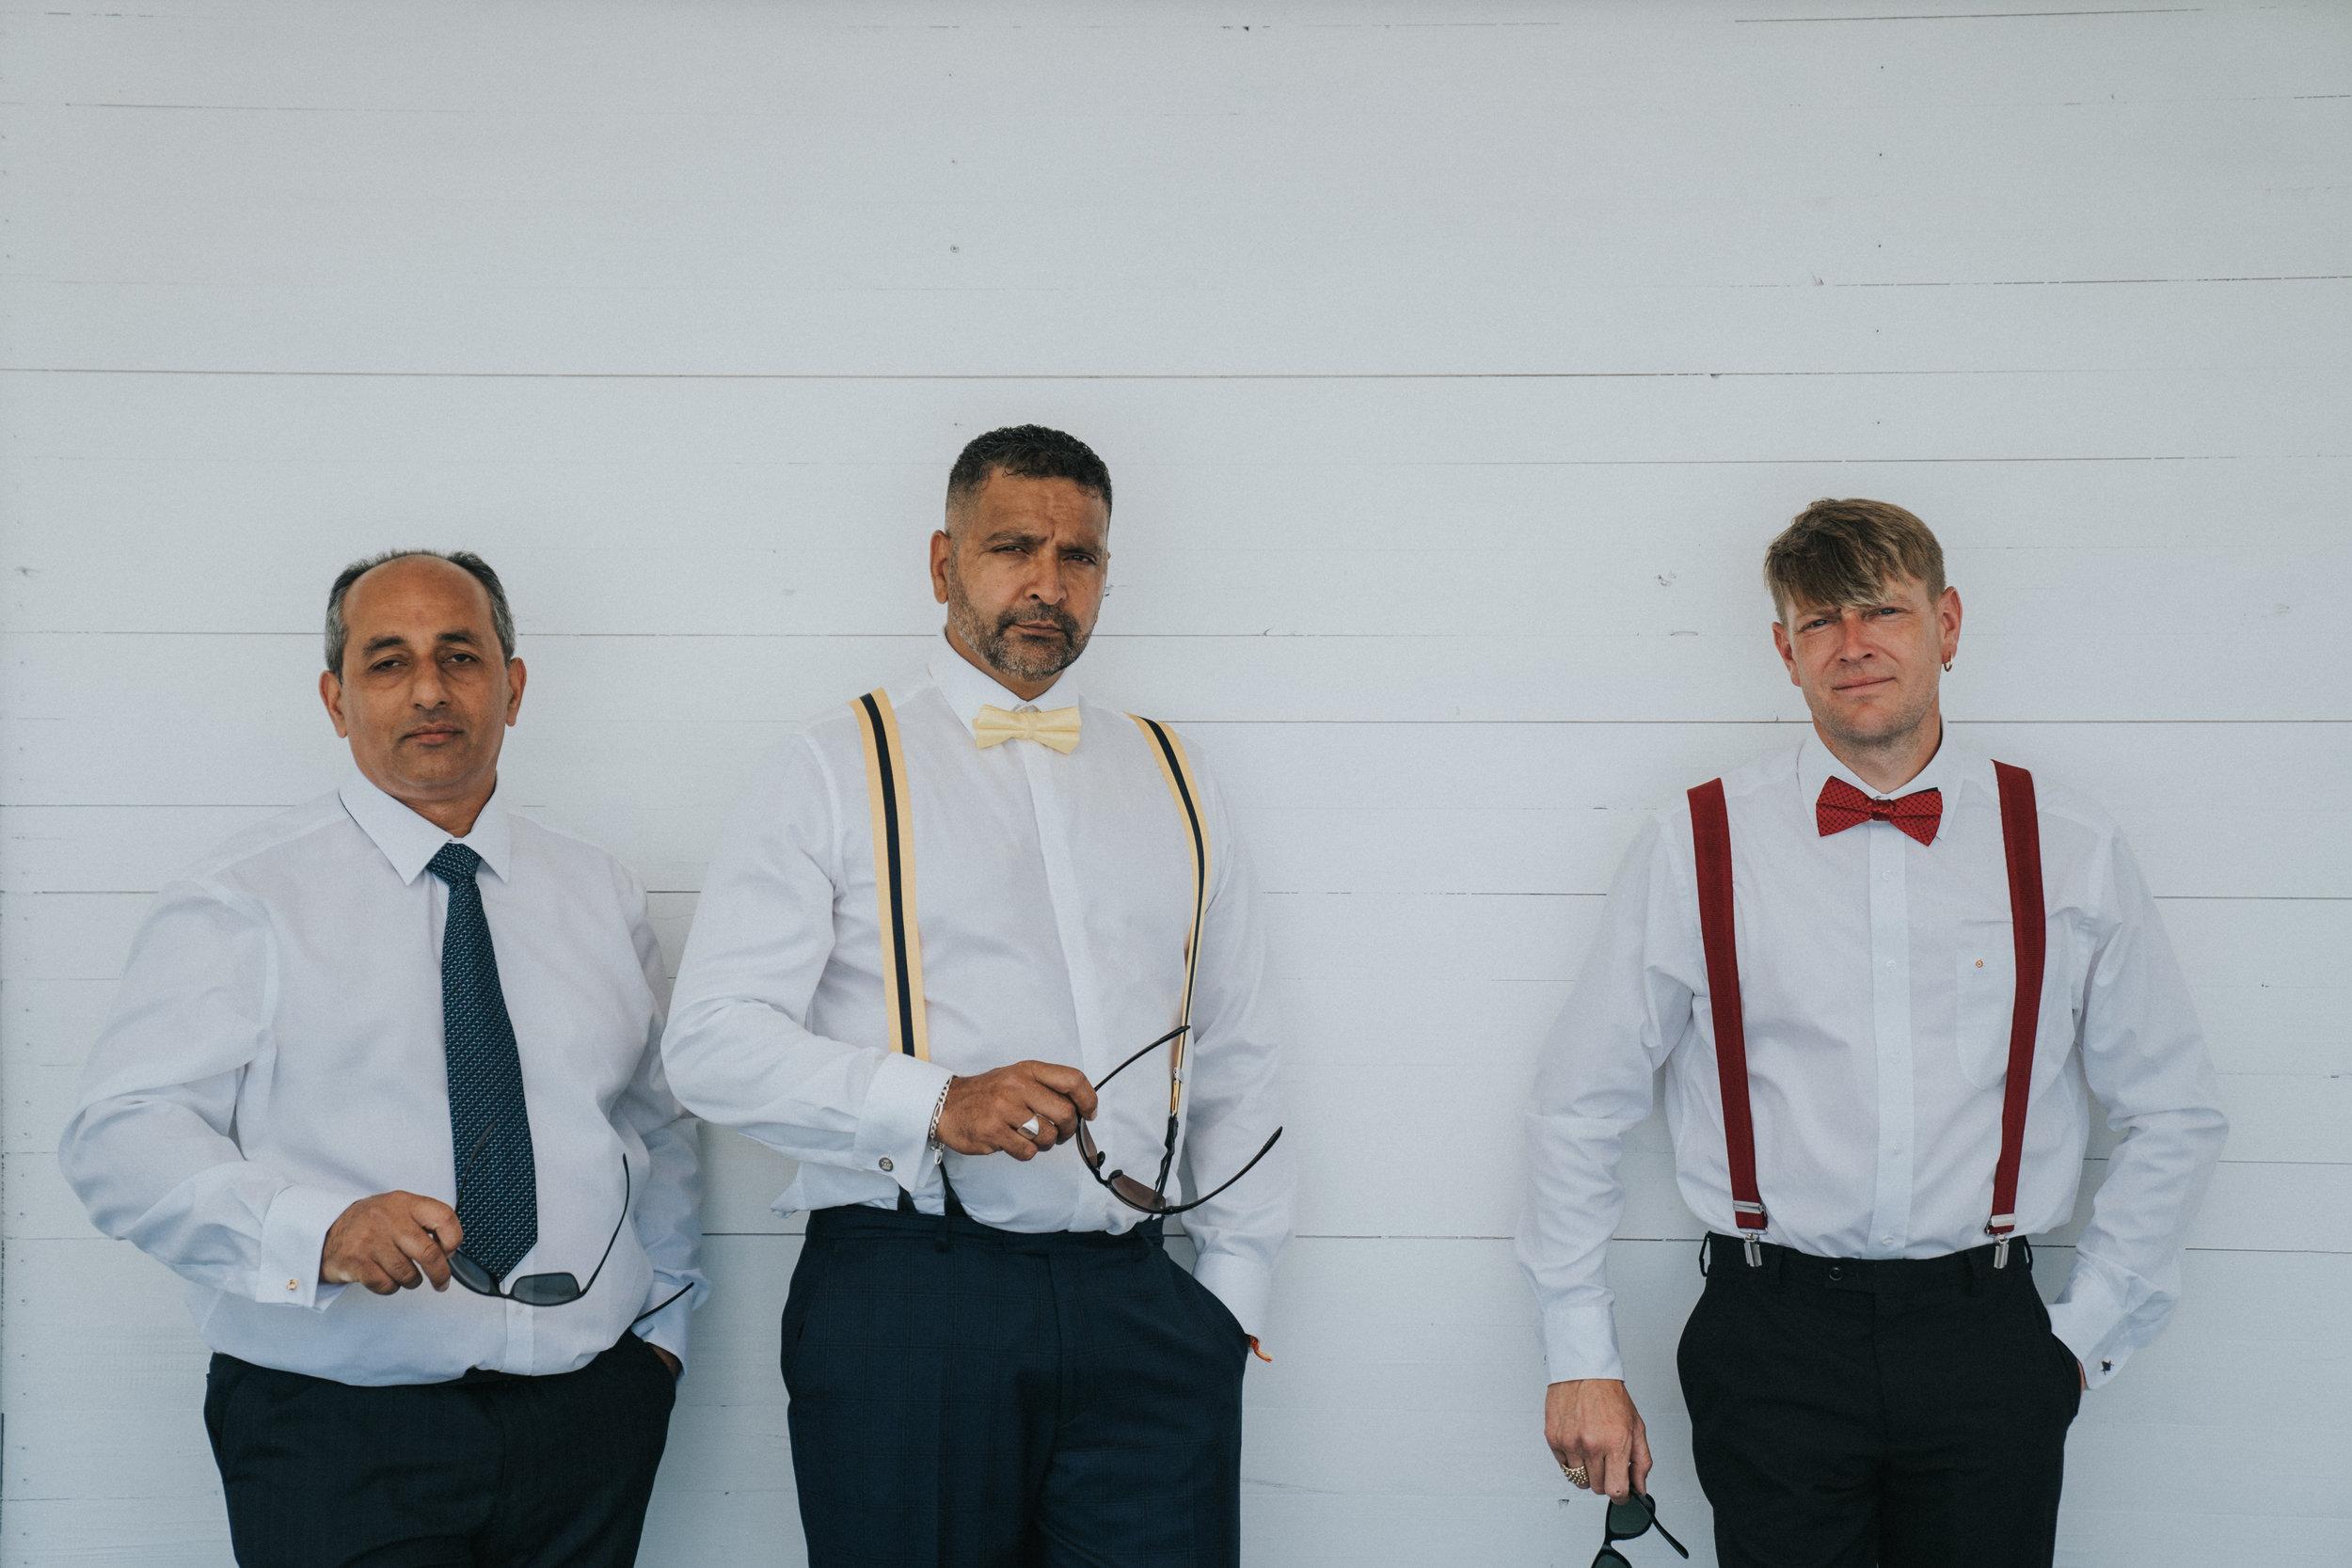 london-romania-destination-wedding-photographer-videographer-10